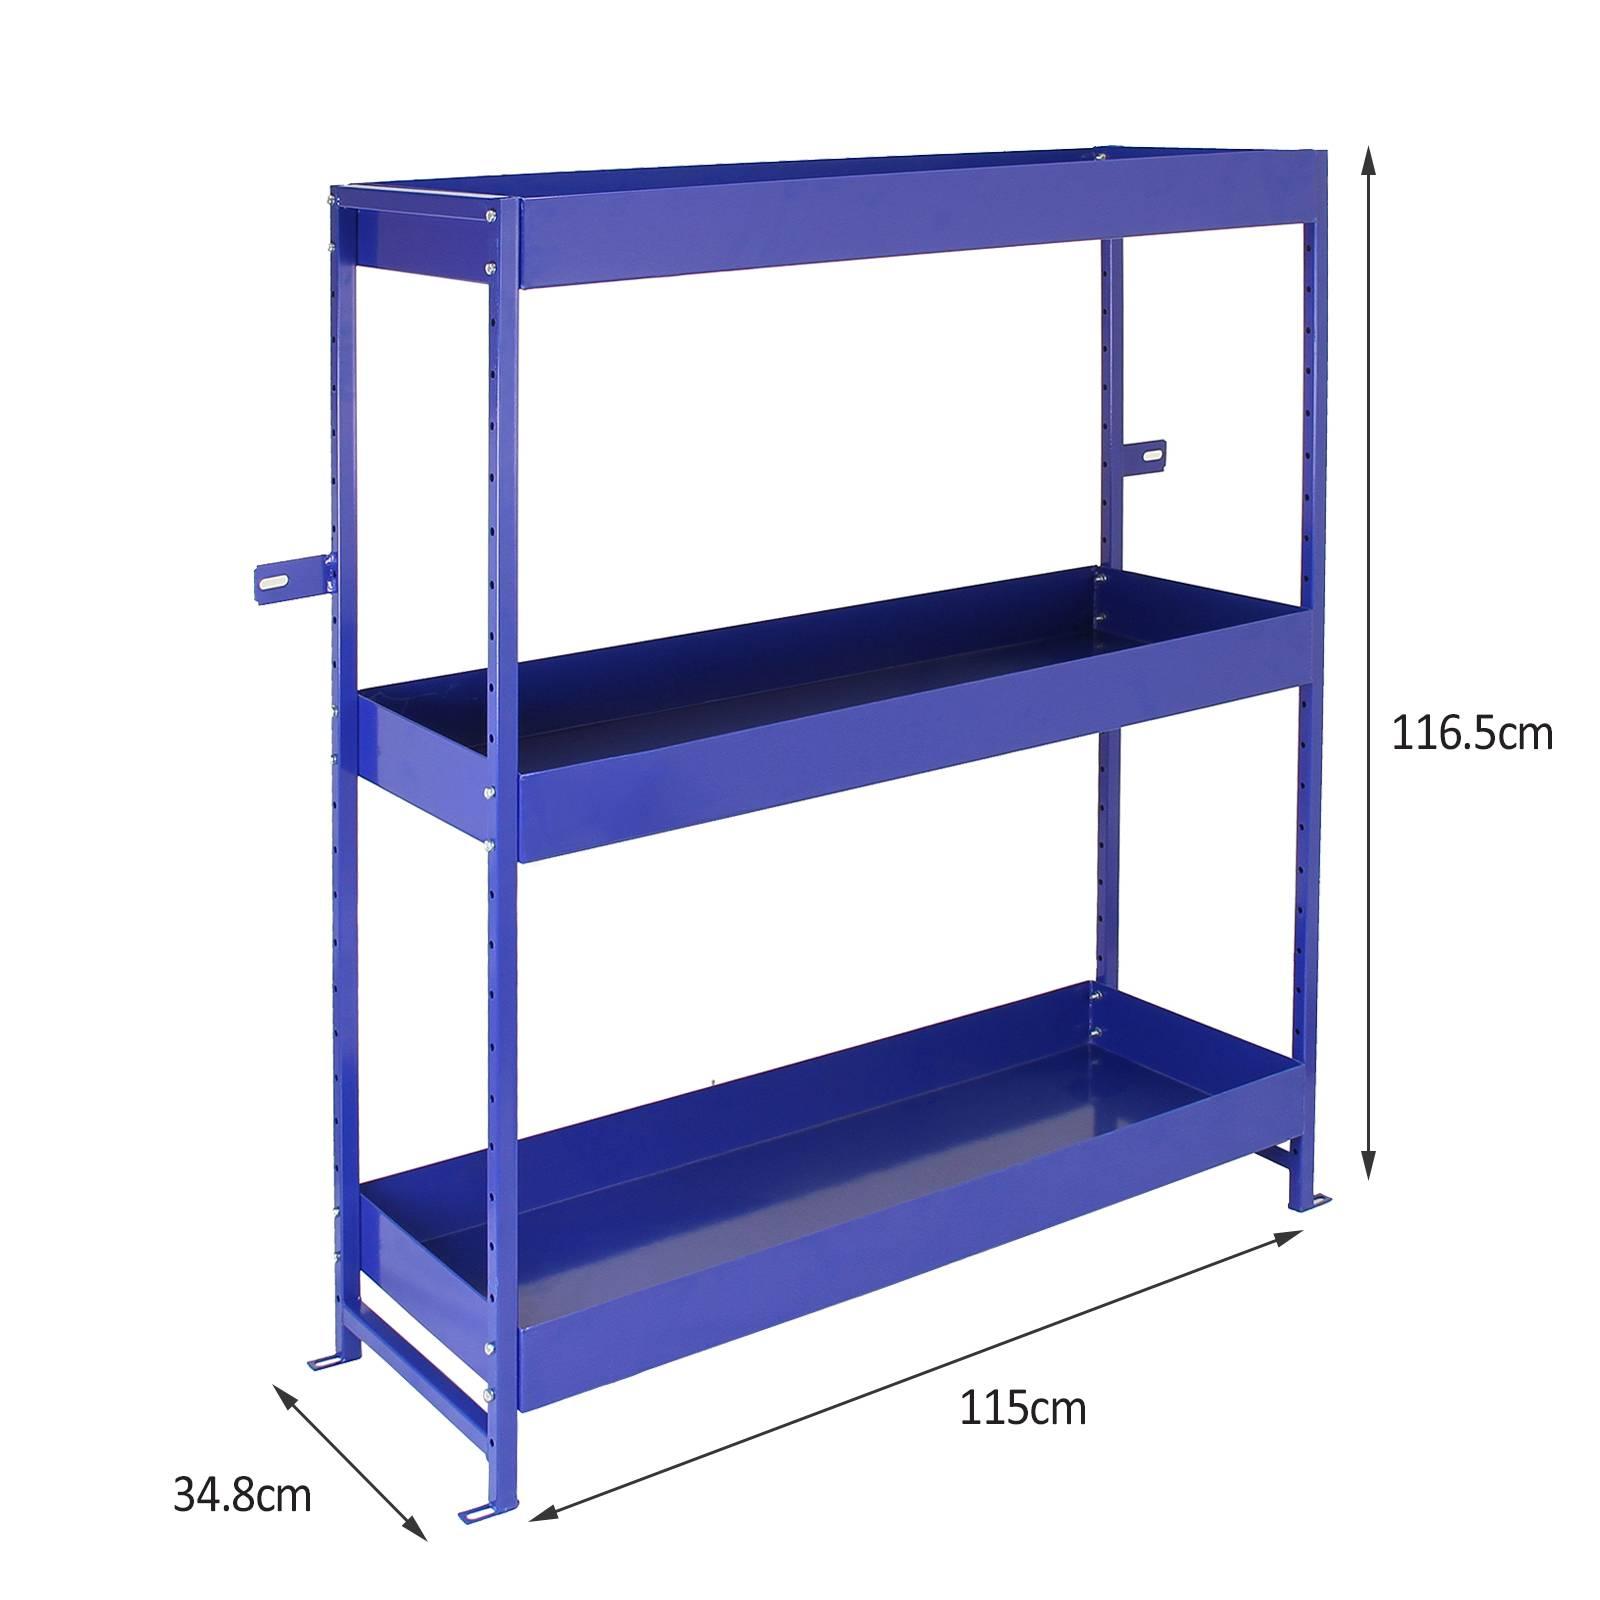 Van Racking Metal Shelving System Tool Storage Shelves